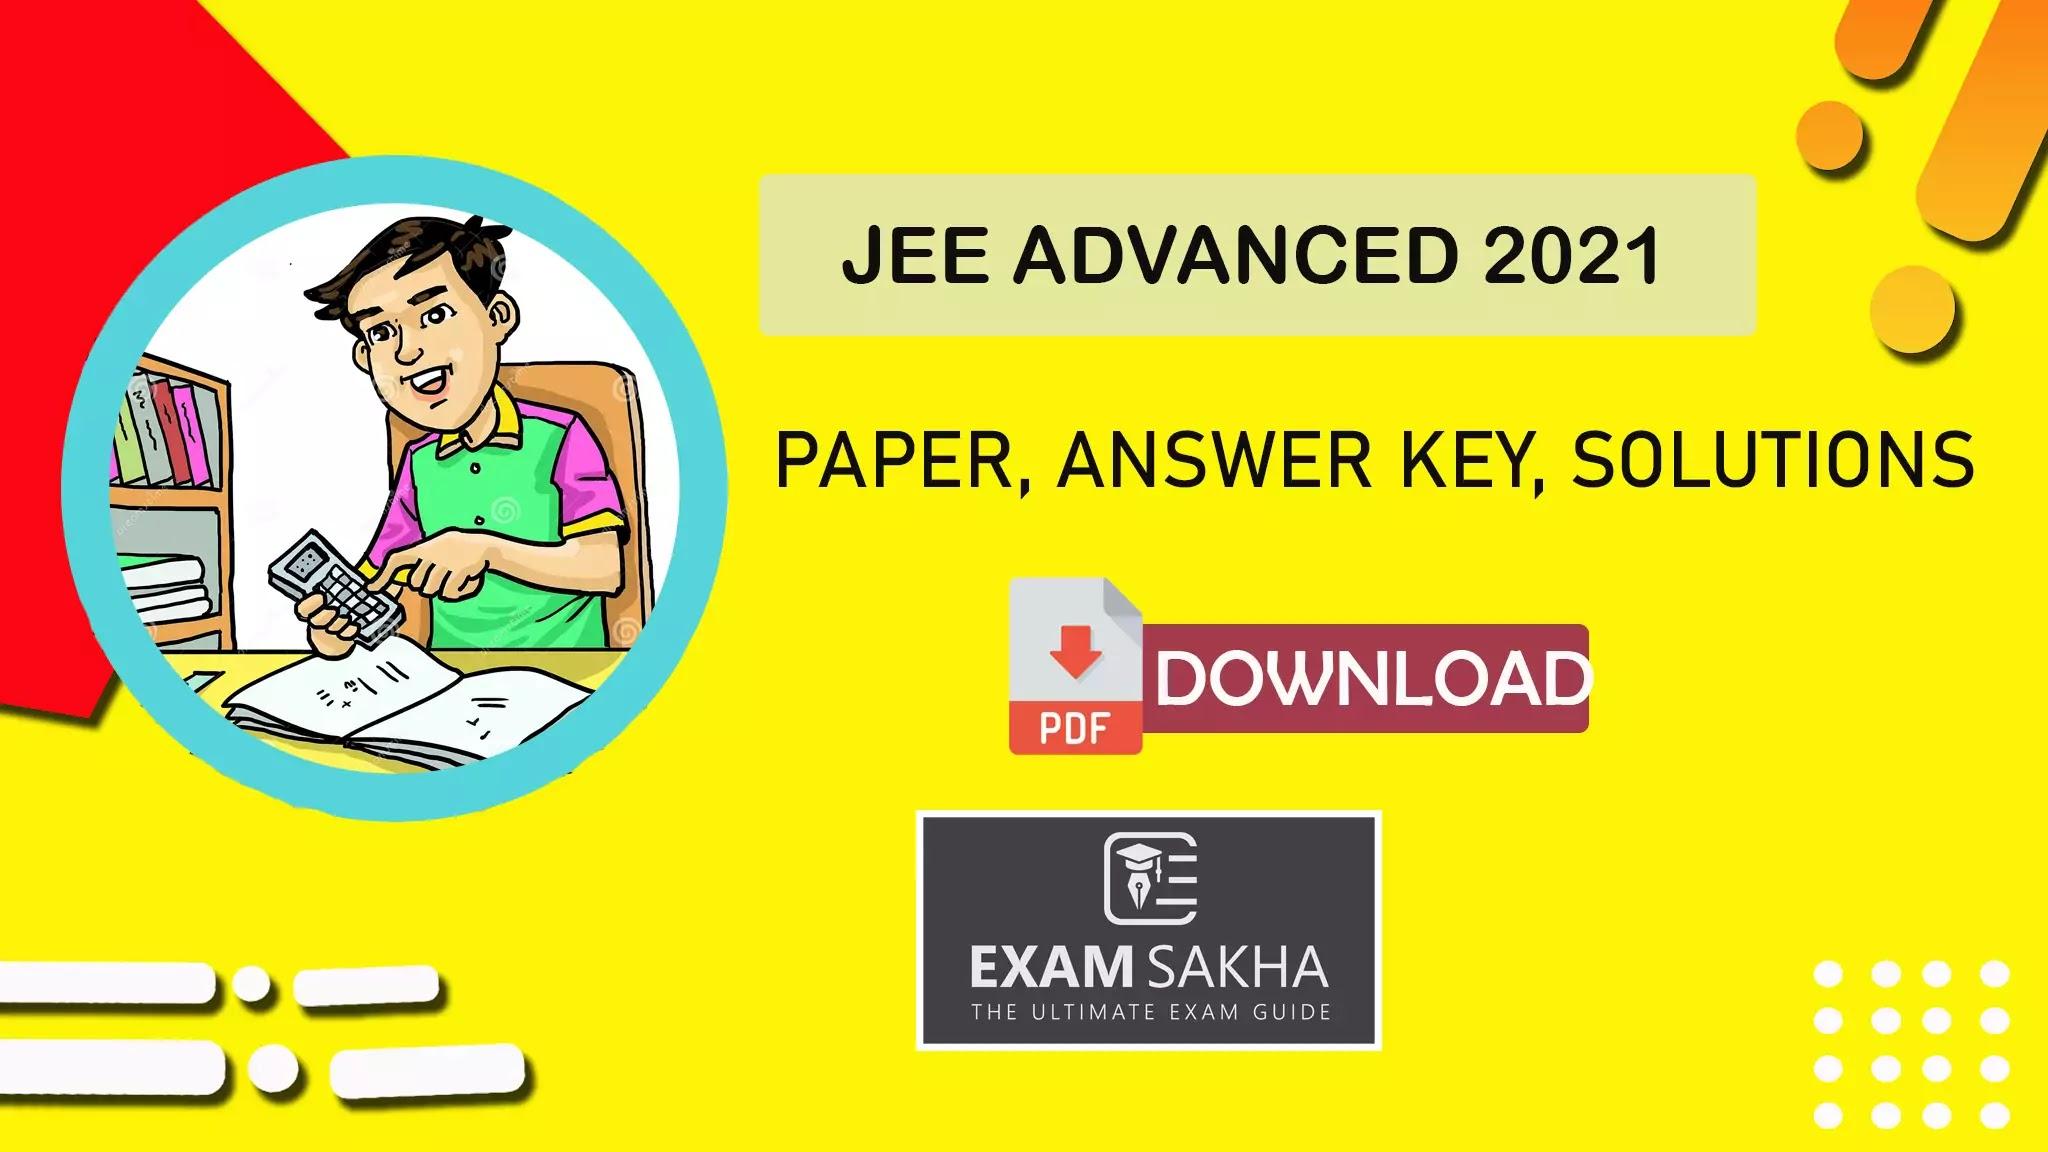 JEE Adv 2021 Paper download